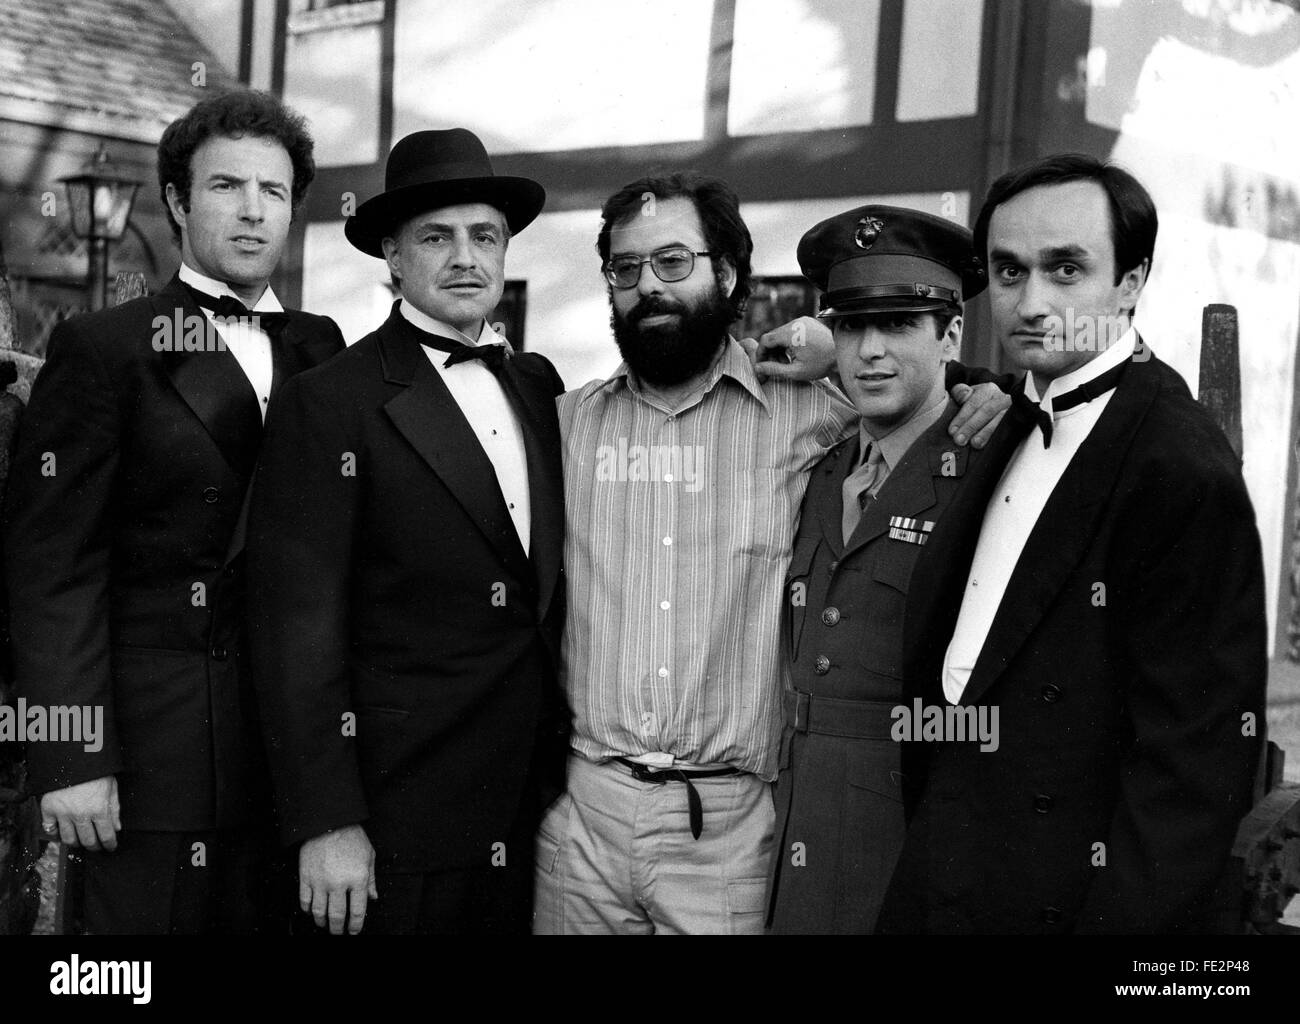 le parrain the godfather 1972 Francis Ford Coppola Marlon Brando Al Pacino James Caan COLLECTION CHRISTOPHEL/ DR Stock Photo